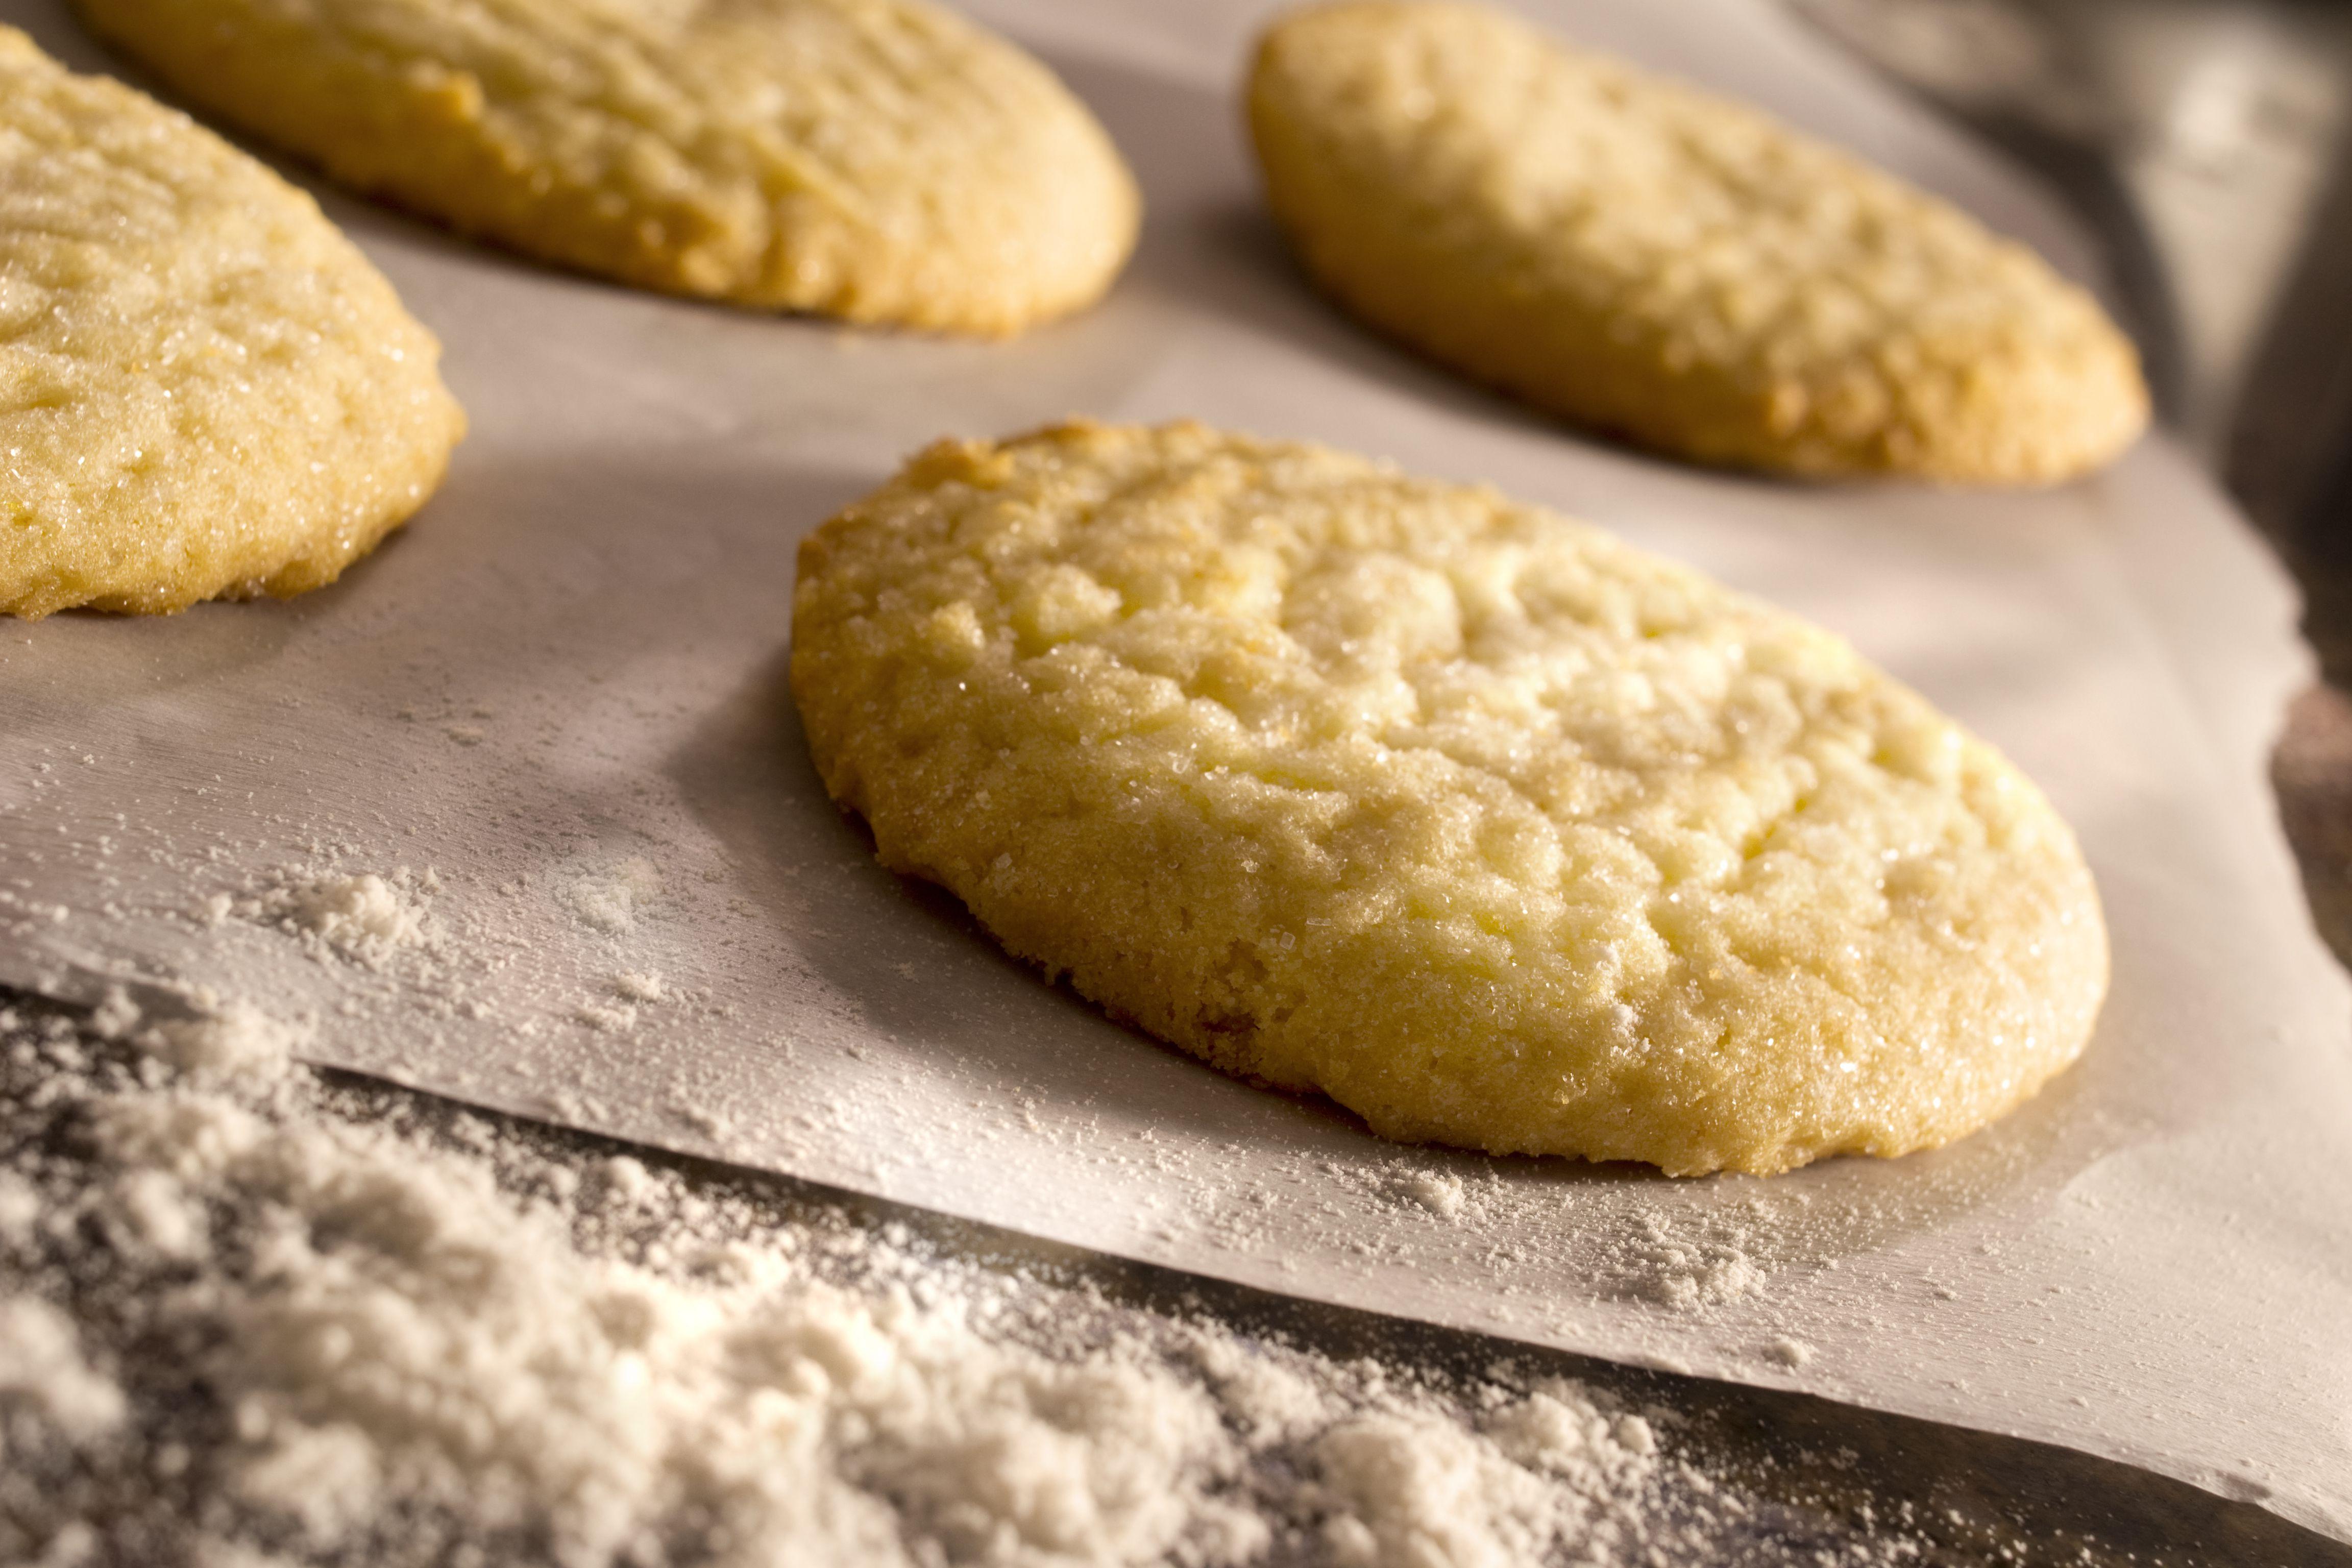 Tender and Delicate, Grandma's Sugar Cookies Are the Best